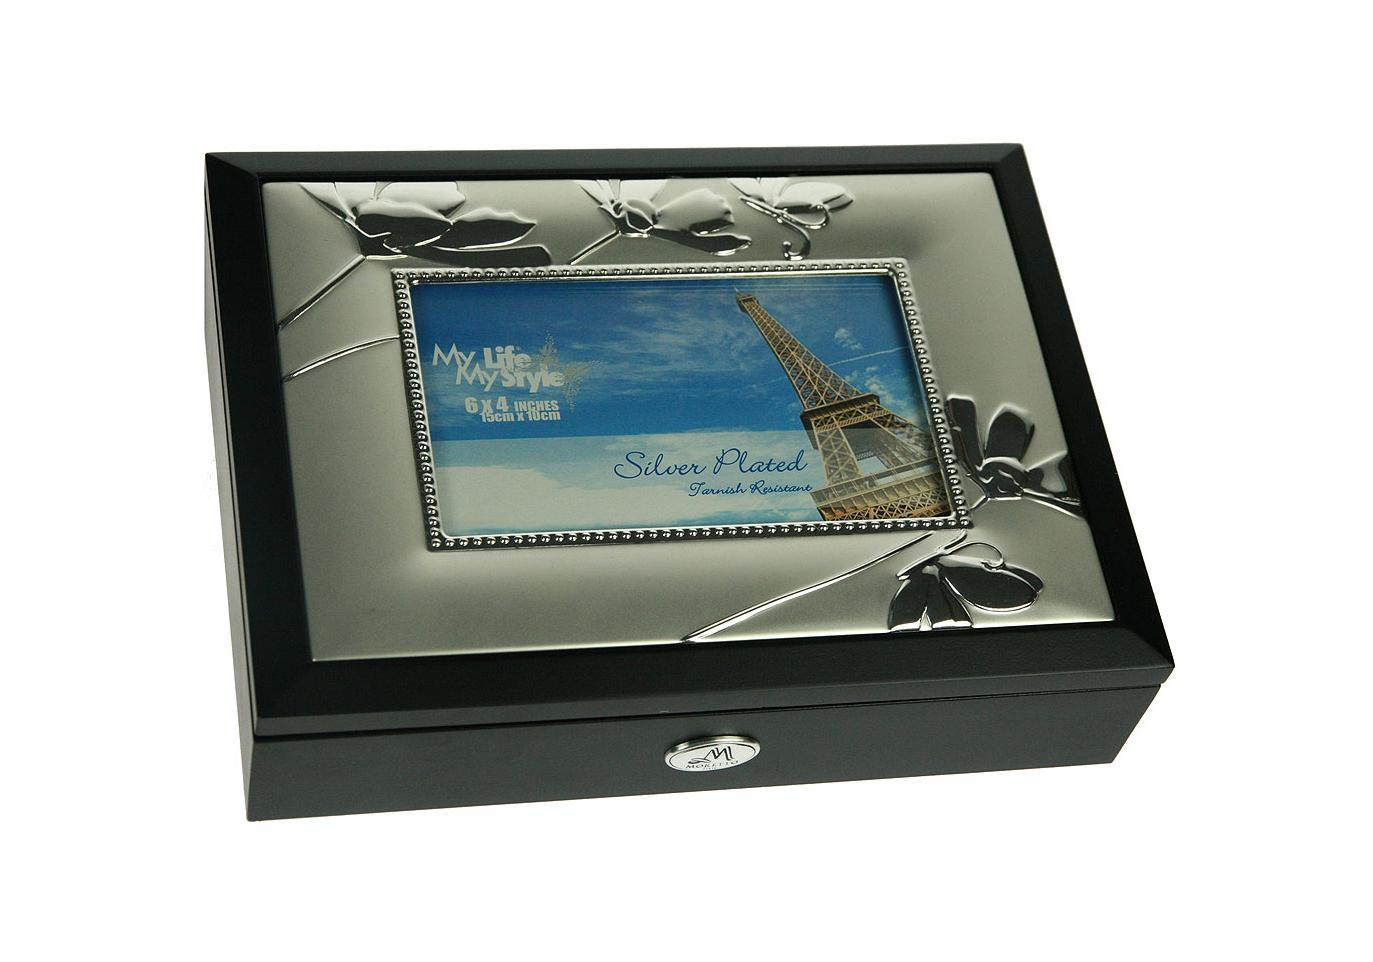 Шкатулка-фоторамка ювелирная Moretto, 24 х 19 х 5 см 139549 статуэтка русские подарки мисс рандеву 11 х 10 х 31 см